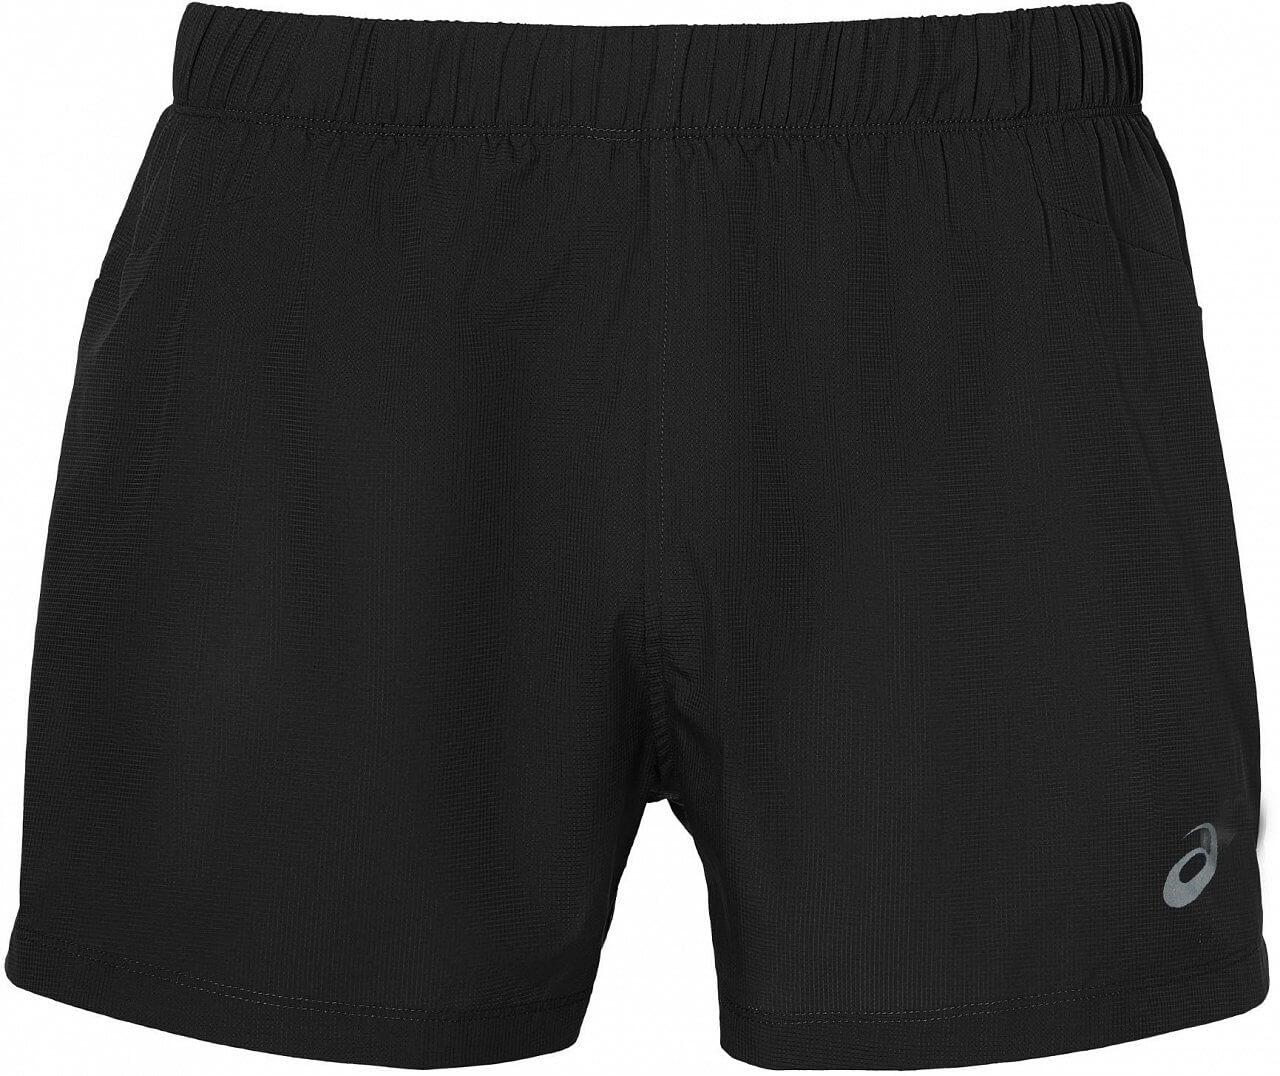 Shorts Asics Cool 2-N-1 5In Short